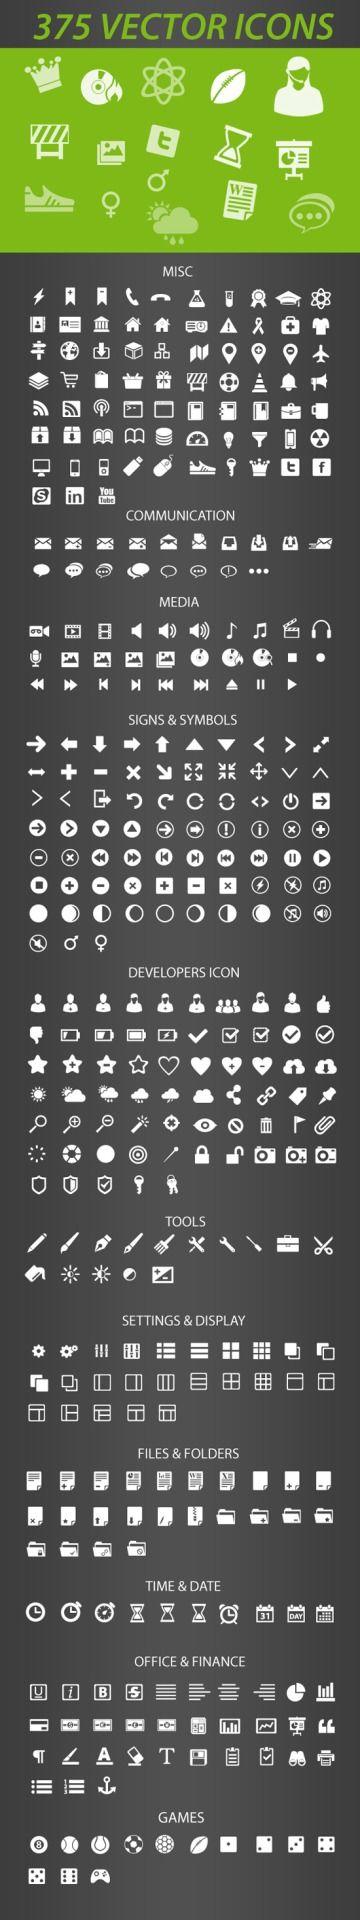 375 Retina-Display-Ready Free Icons